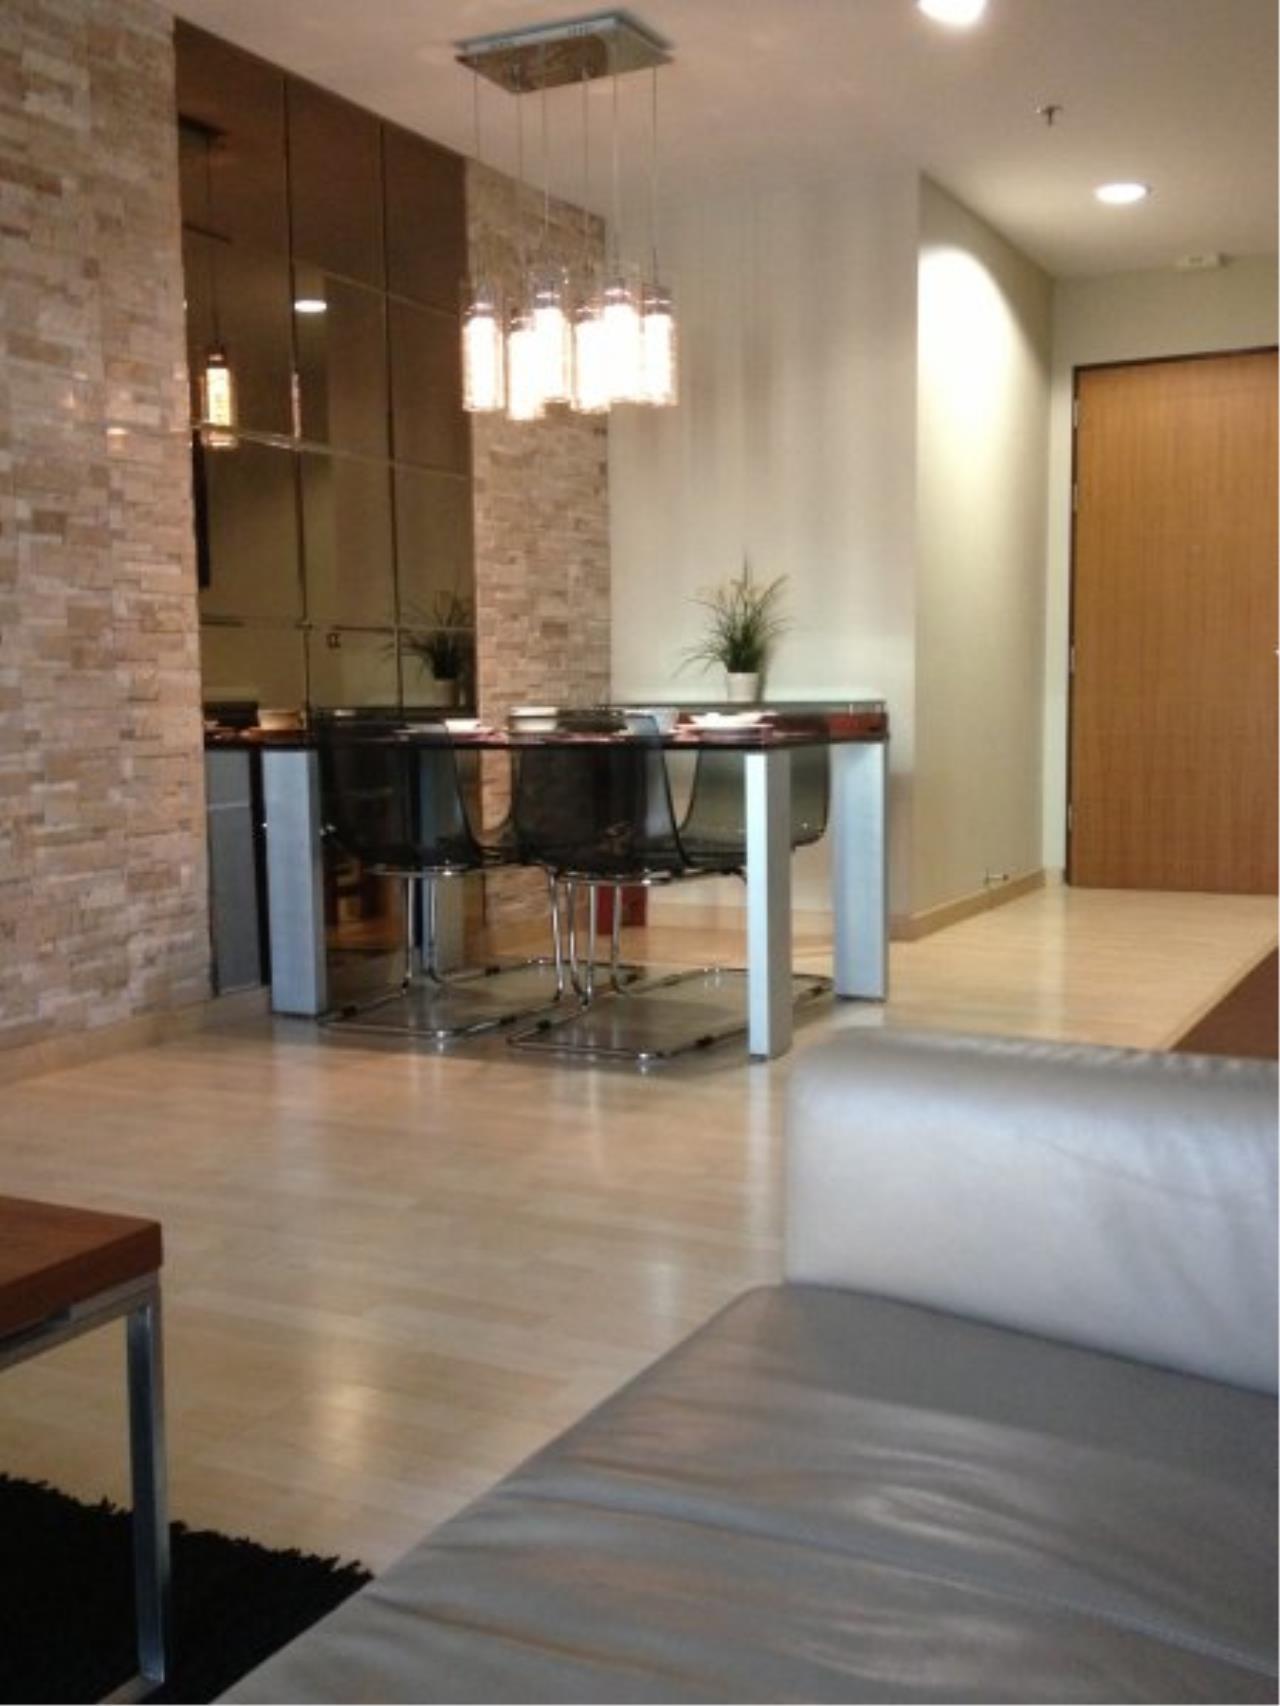 Piri Property Agency's Modern 2 Bedrooms in the 59 Heritage Bulding for rent on high floor 6